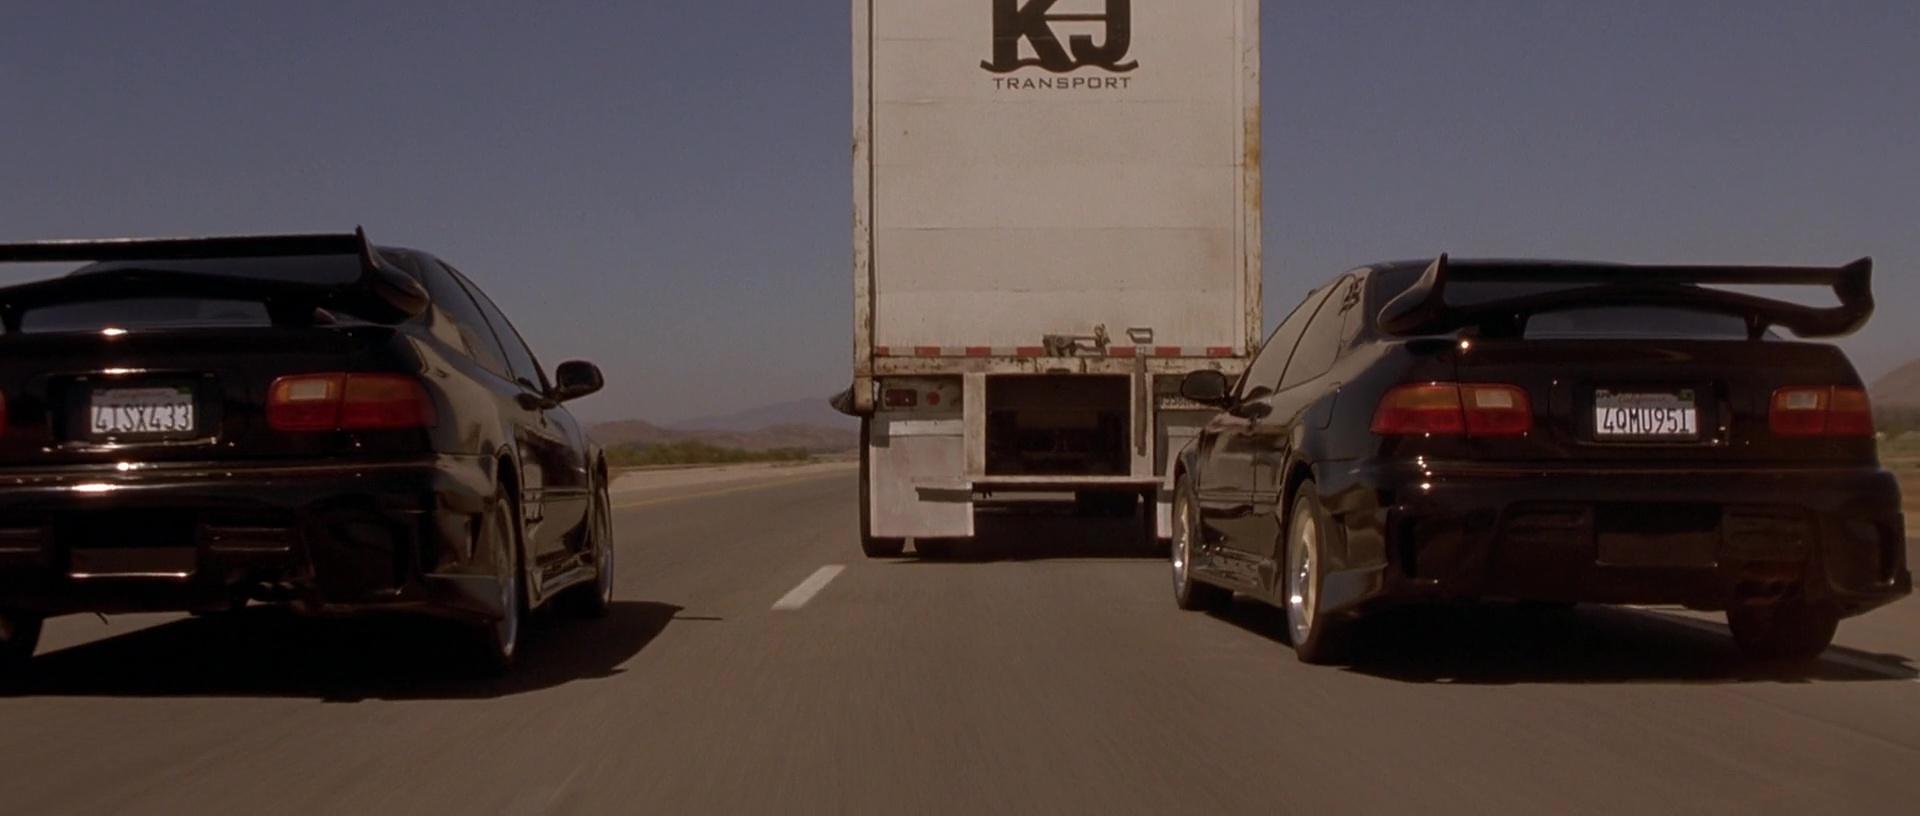 Image - Honda Civic - Last Truck Hijack.jpg | The Fast and the ...